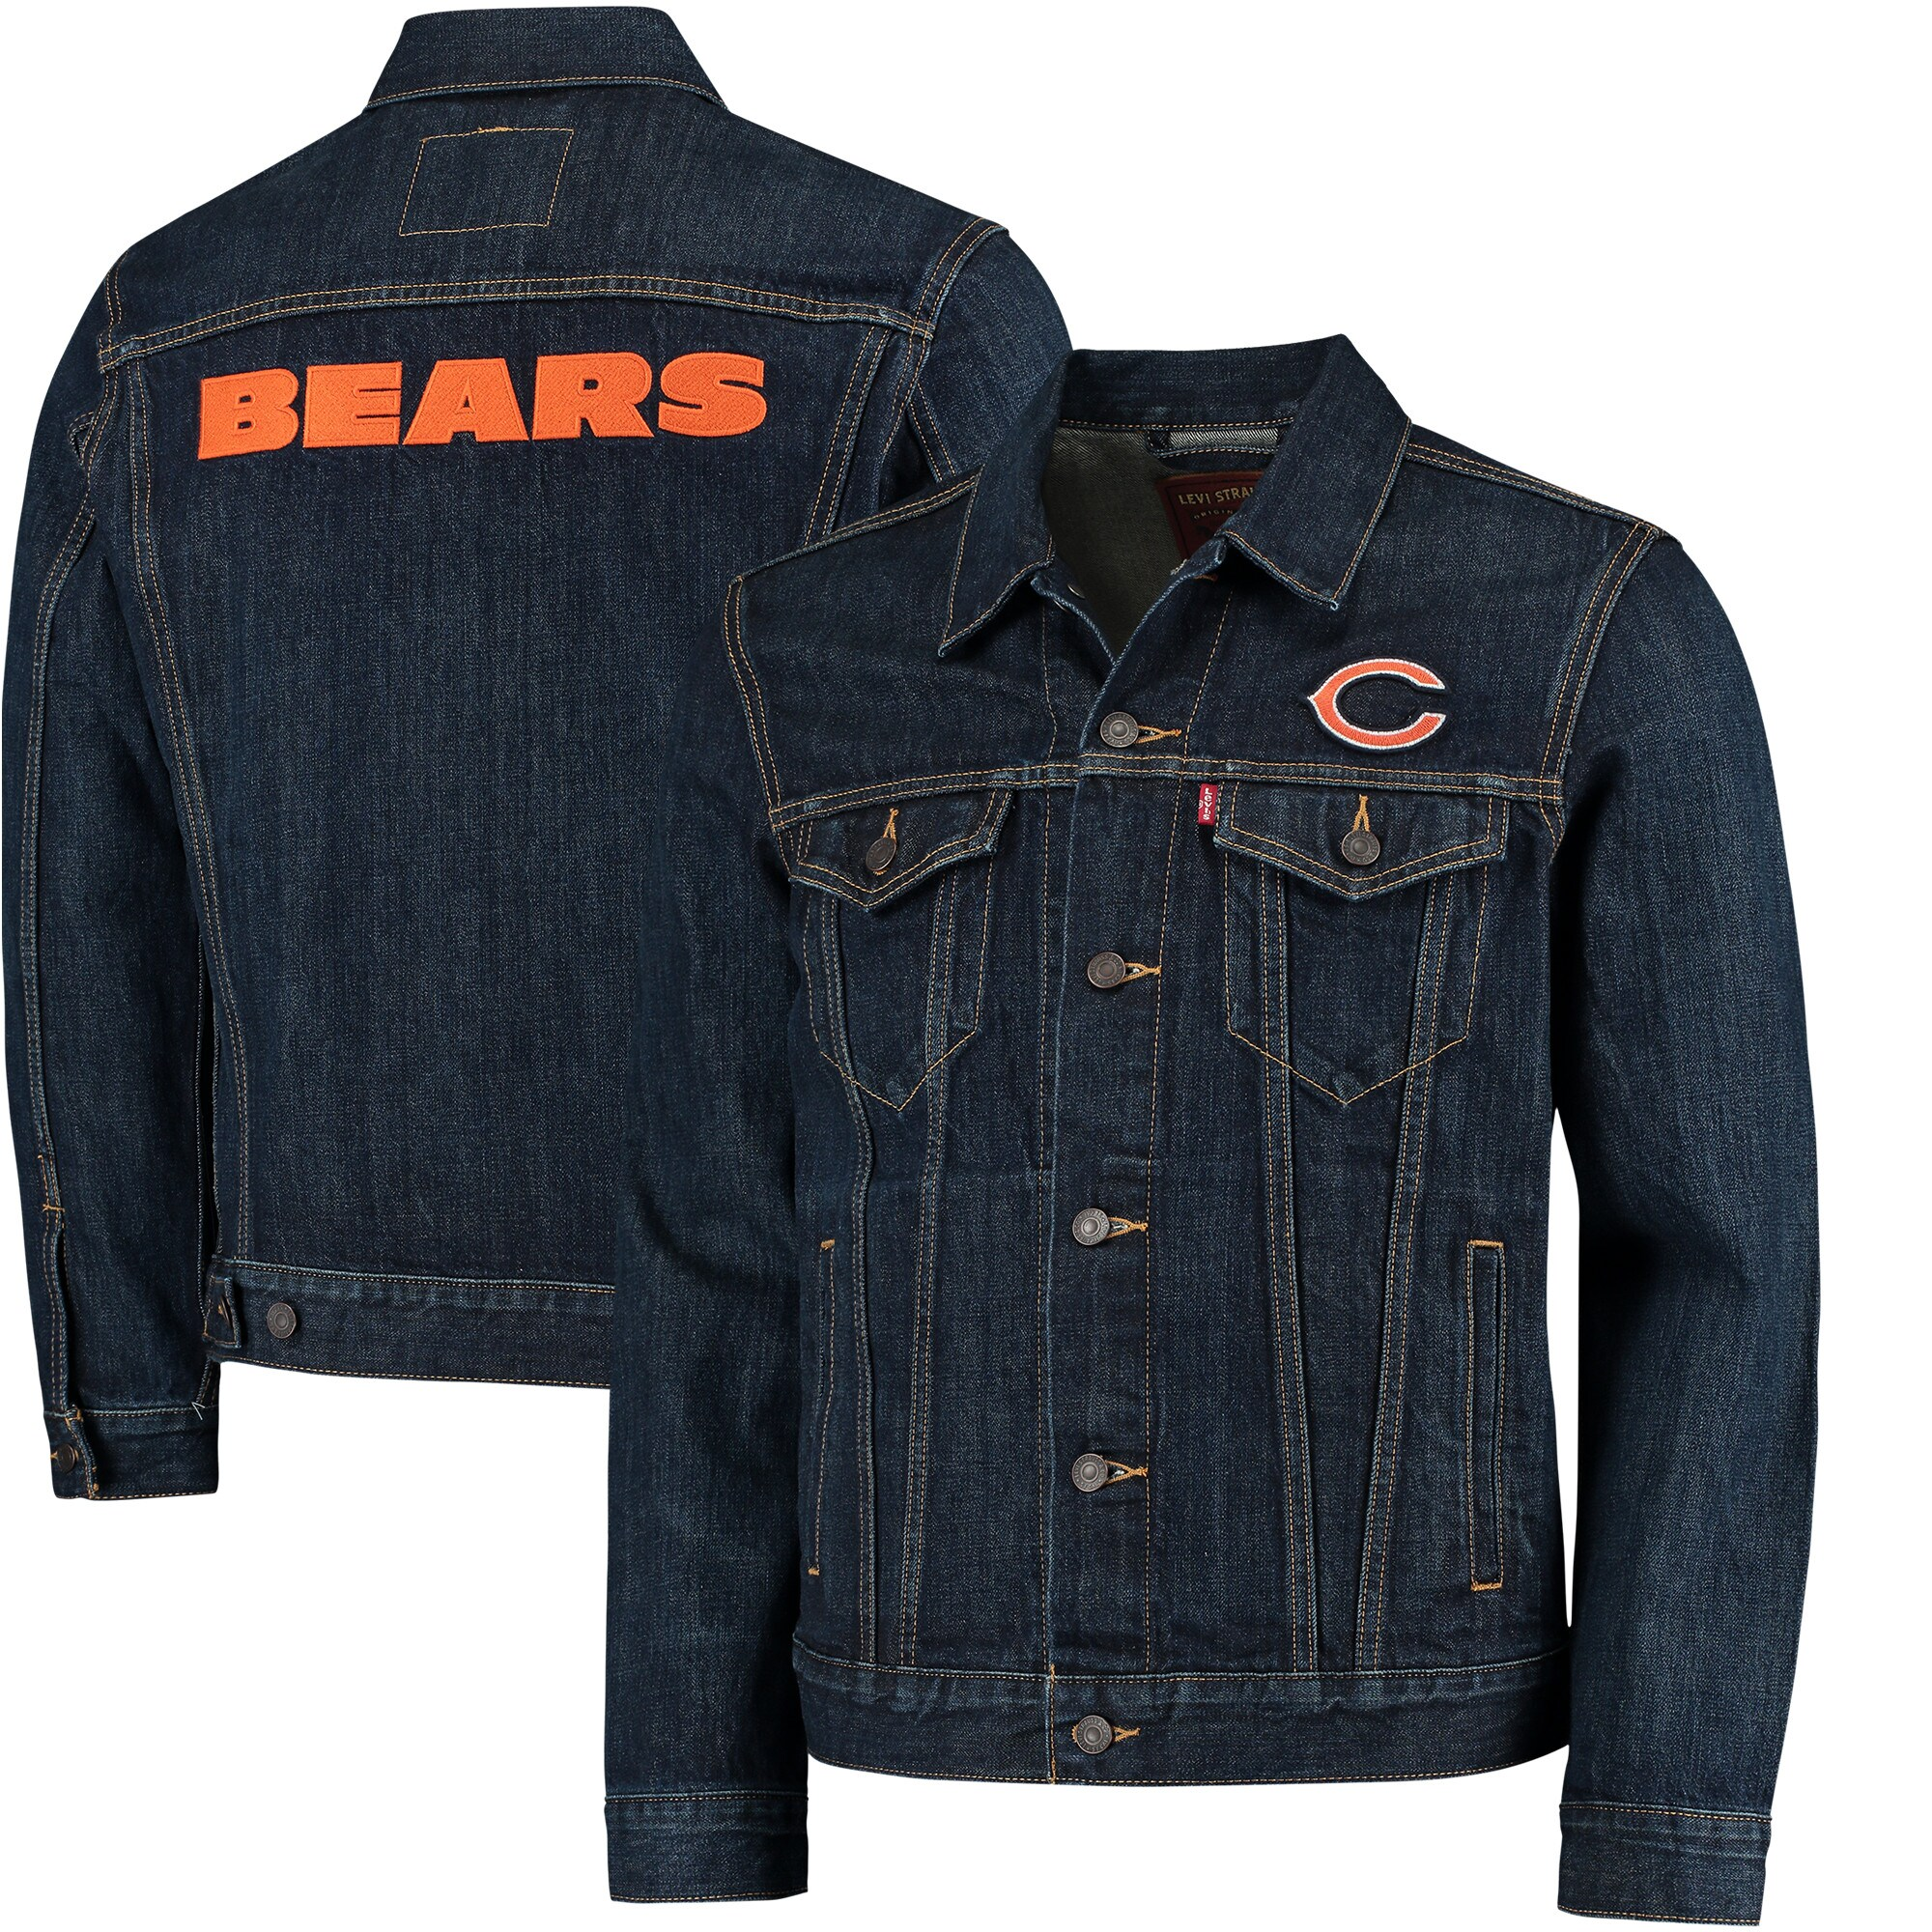 Chicago Bears Levi's Sports Denim Trucker Jacket - Blue